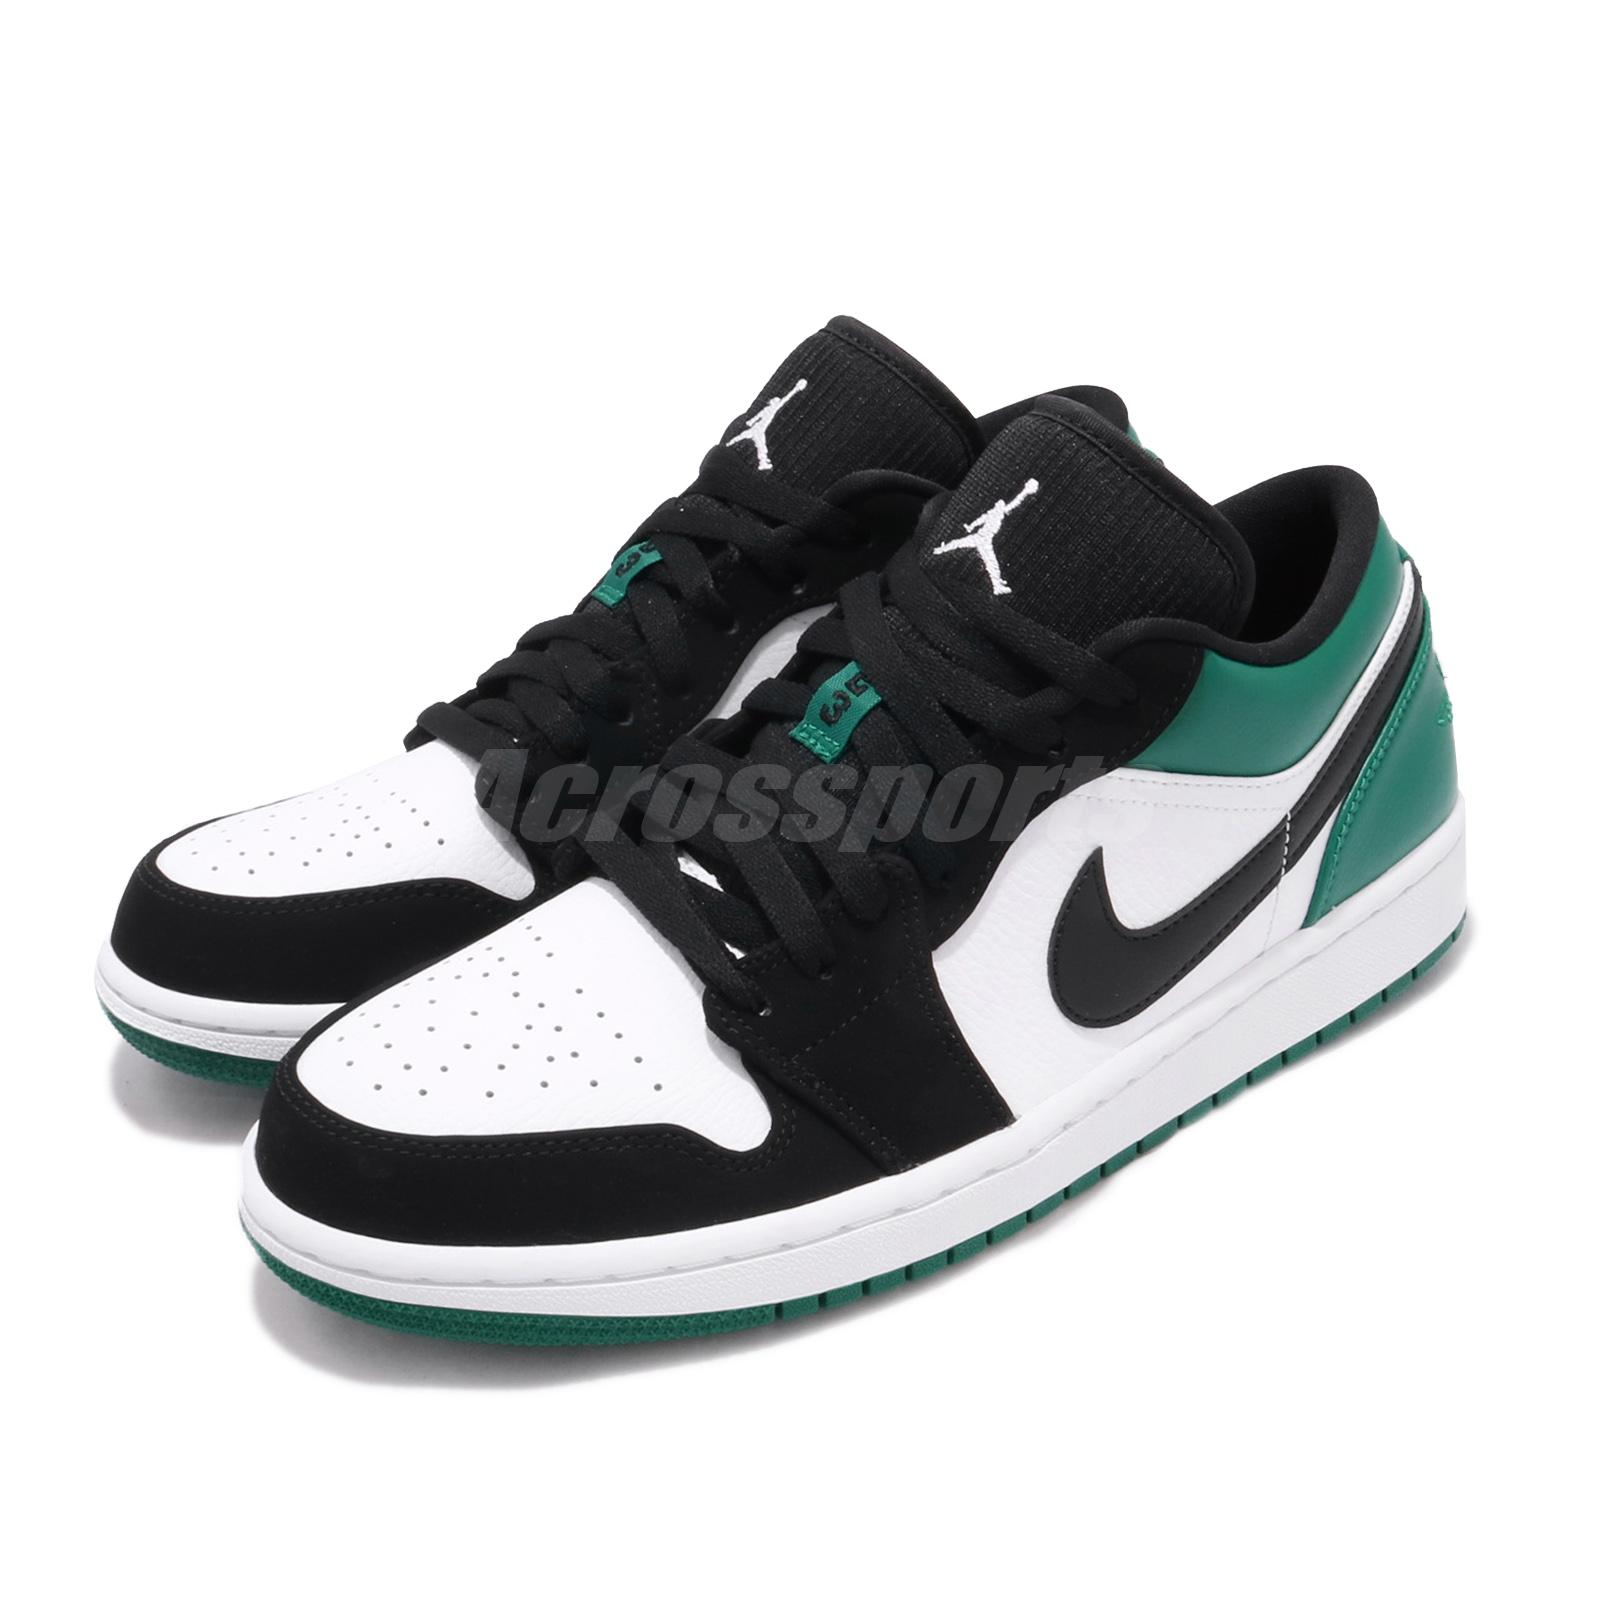 buy popular 1916c 588c5 Details about Nike Air Jordan 1 Low I AJ1 Mystic Green White Black Men Shoe  Sneaker 553558-113